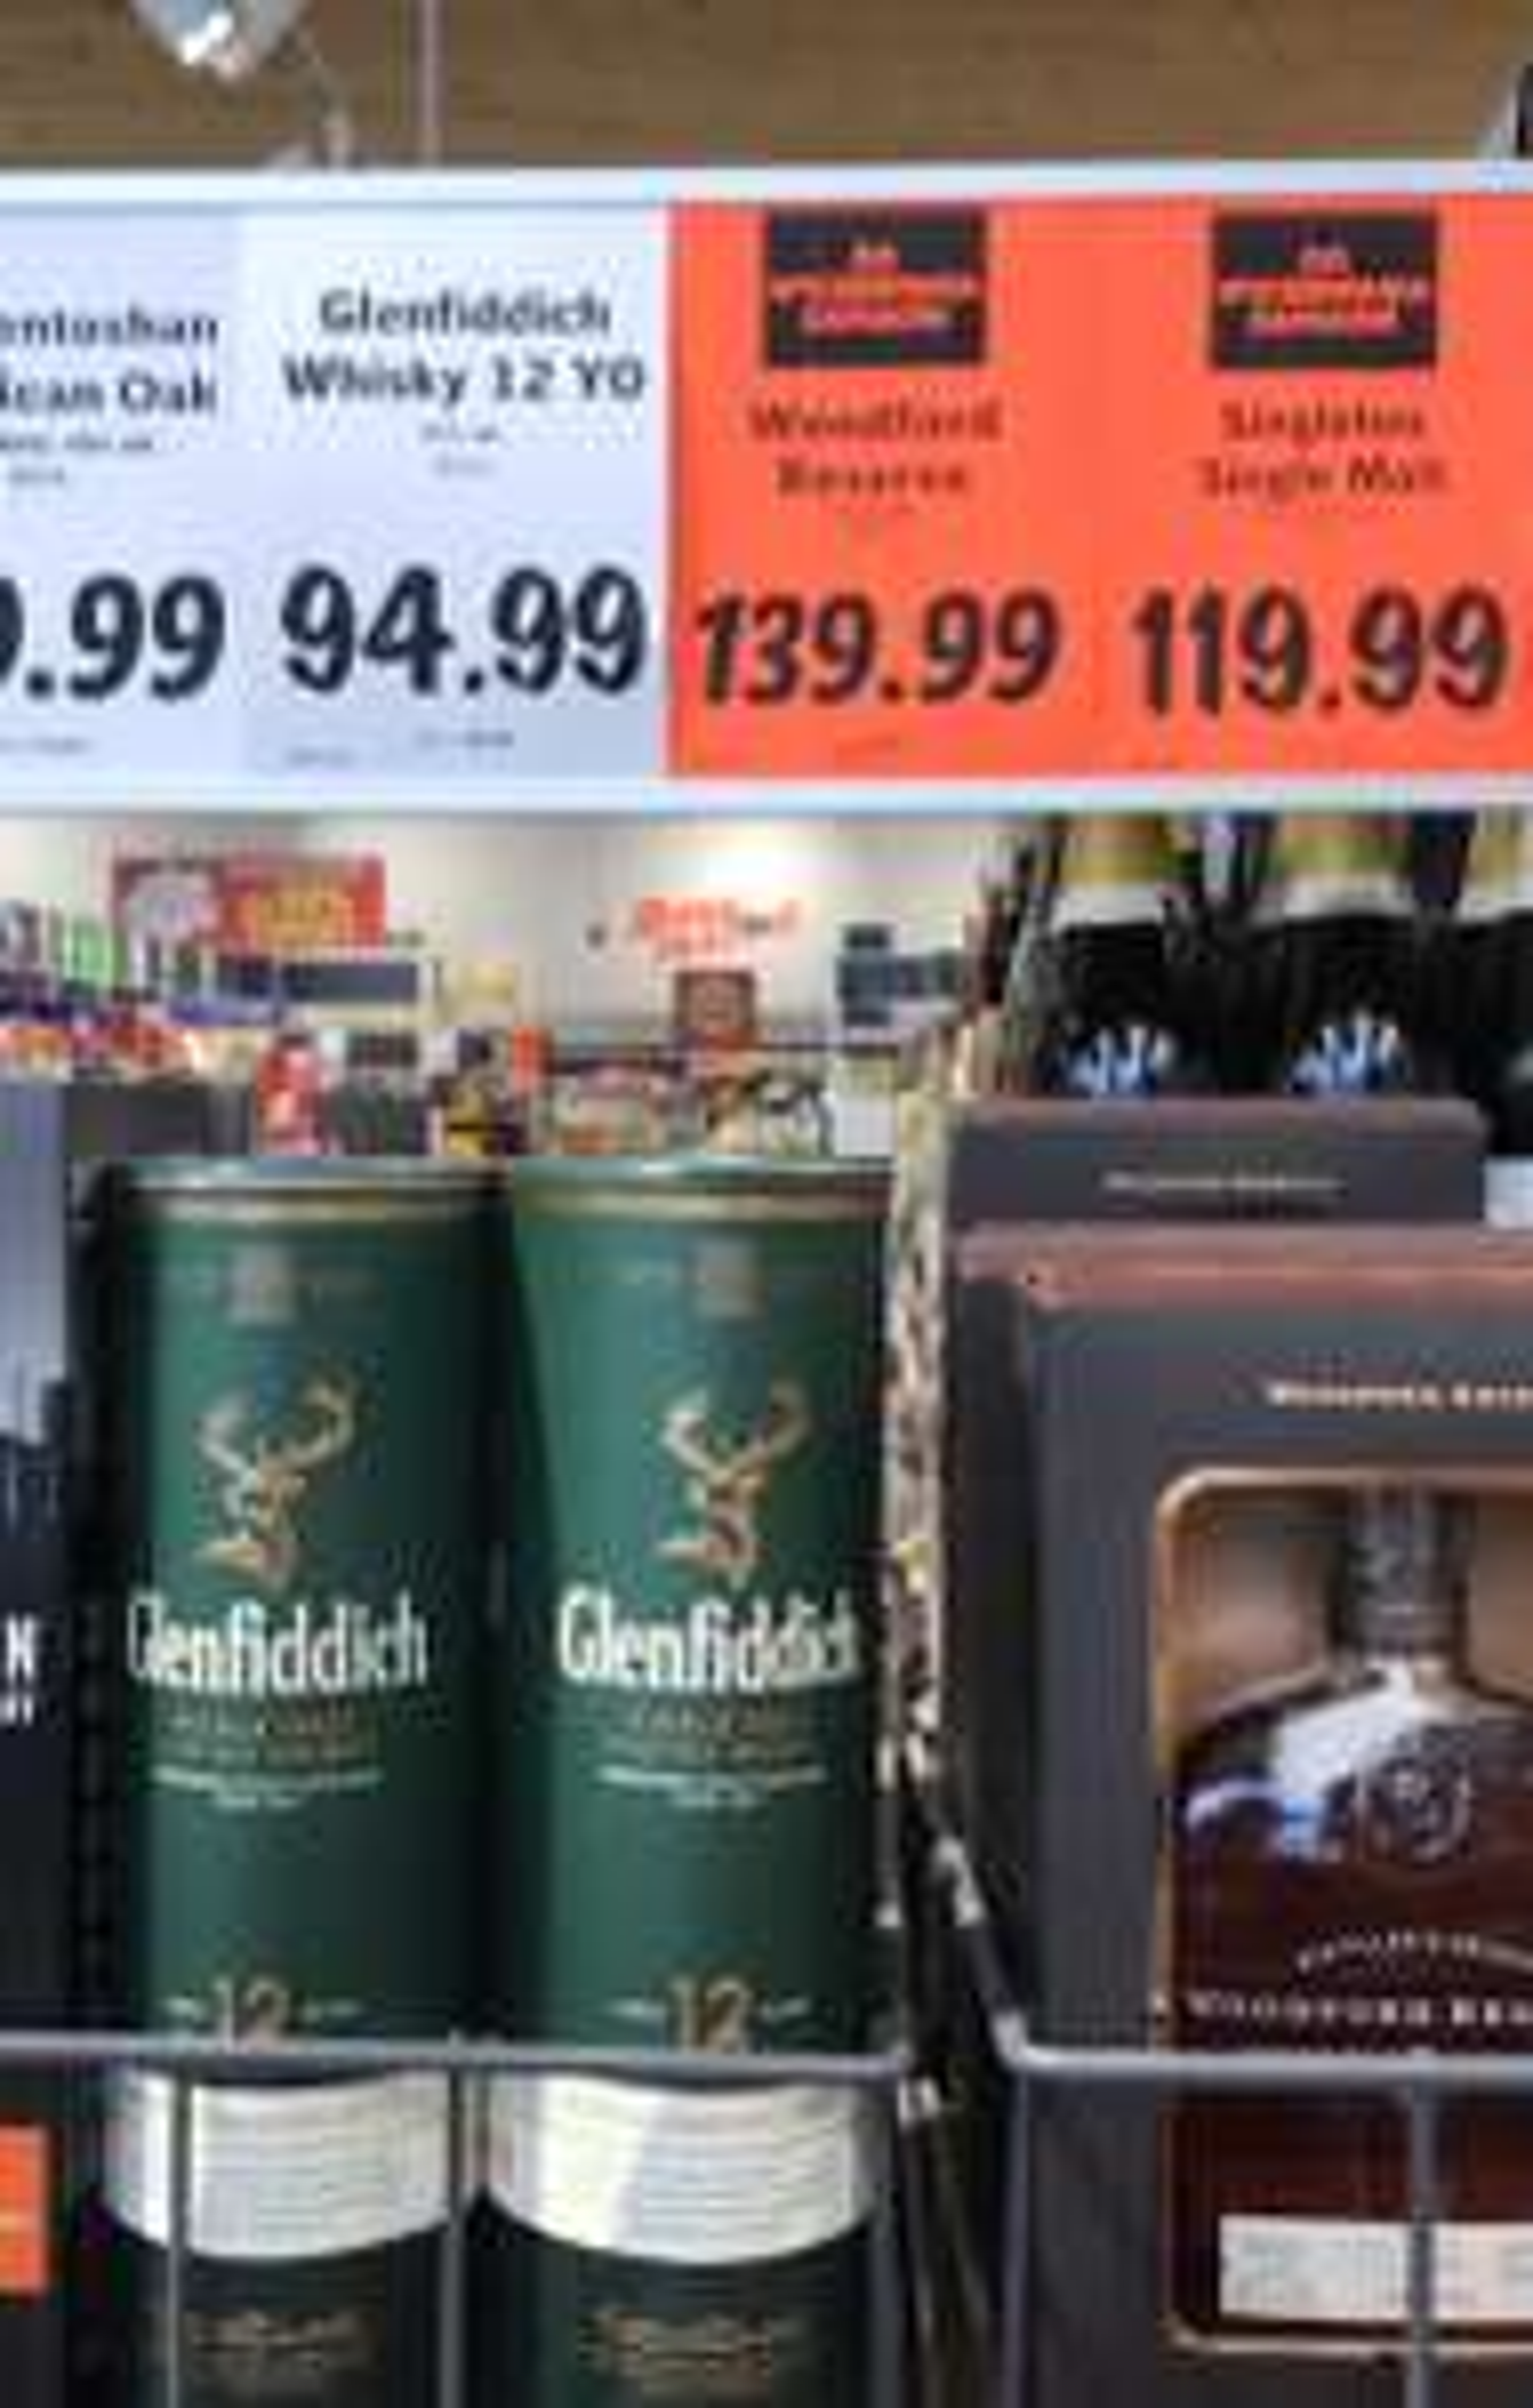 Glenfiddich Whisky 12 YO LIDL